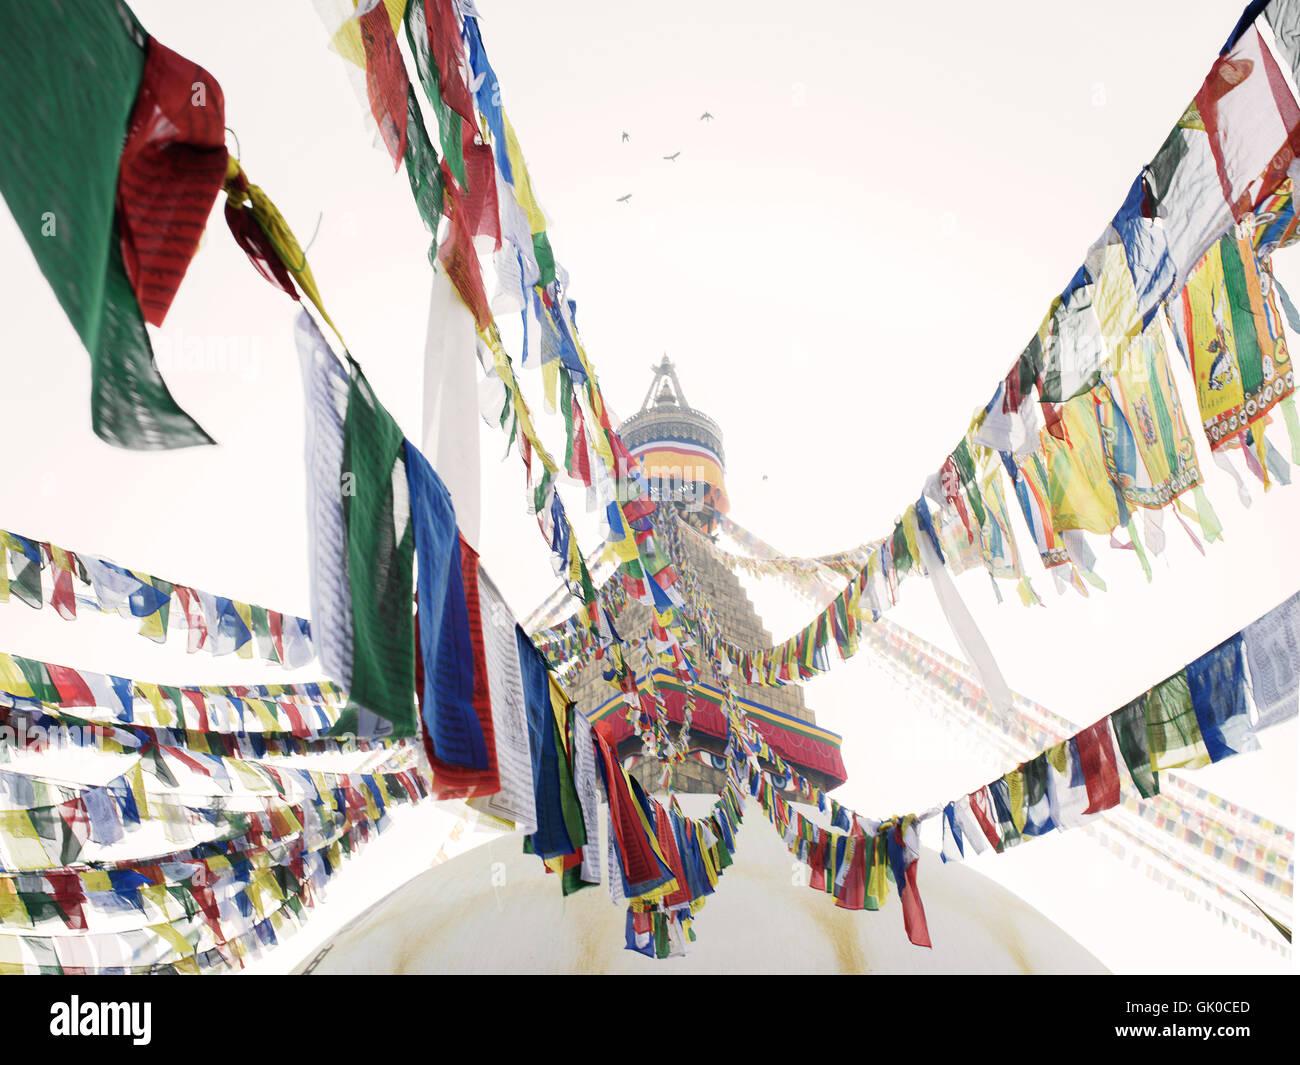 Gebetsfahnen im Boudhanath Tempel in Kathmandu, Nepal. Stockbild